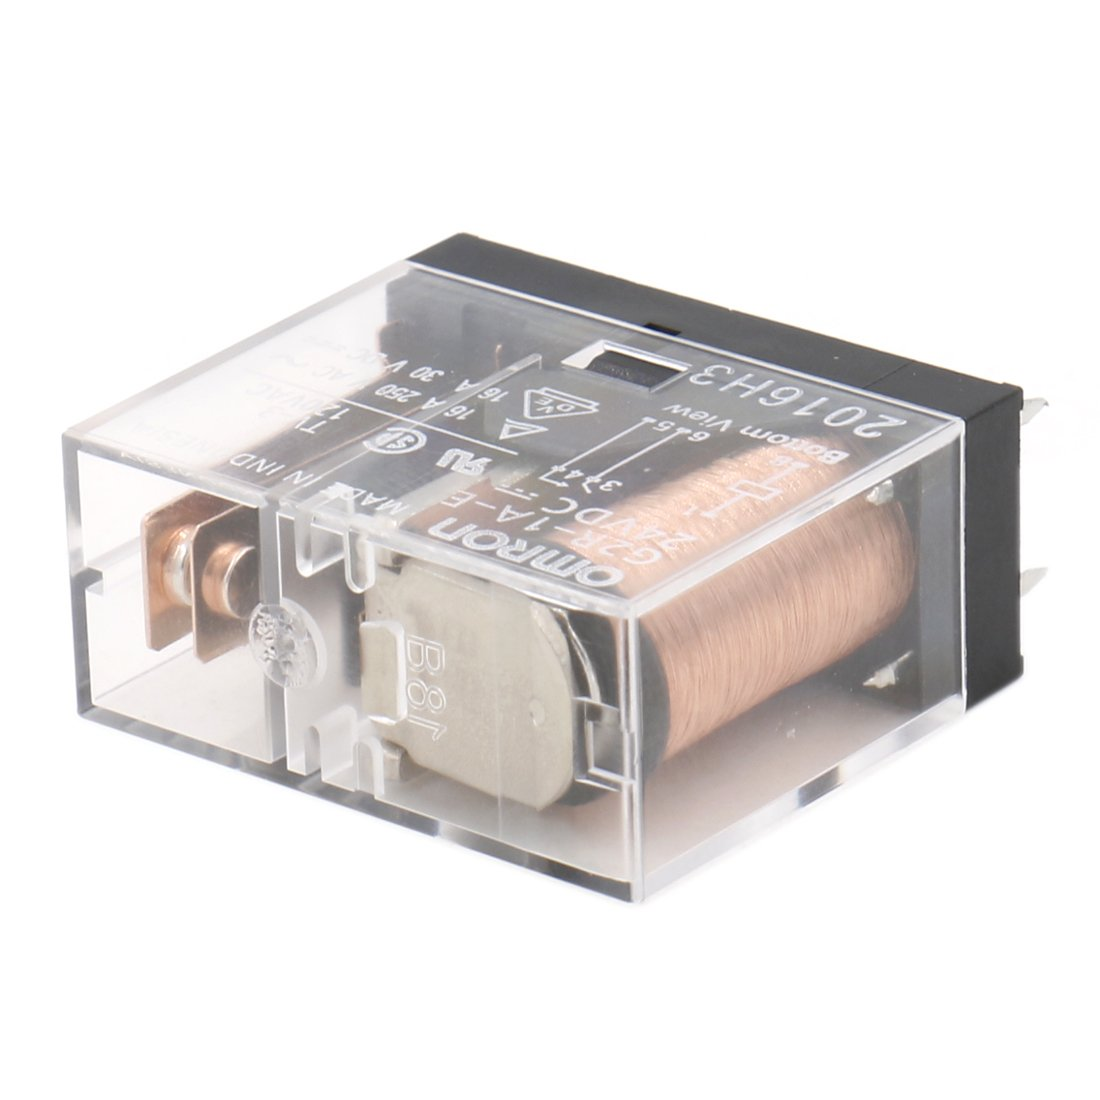 Heschen Relé electromagnético G2R-1A-E 24VDC SPST-NO 16A / 250VAC Montaje PCB 6 pin: Amazon.es: Industria, empresas y ciencia